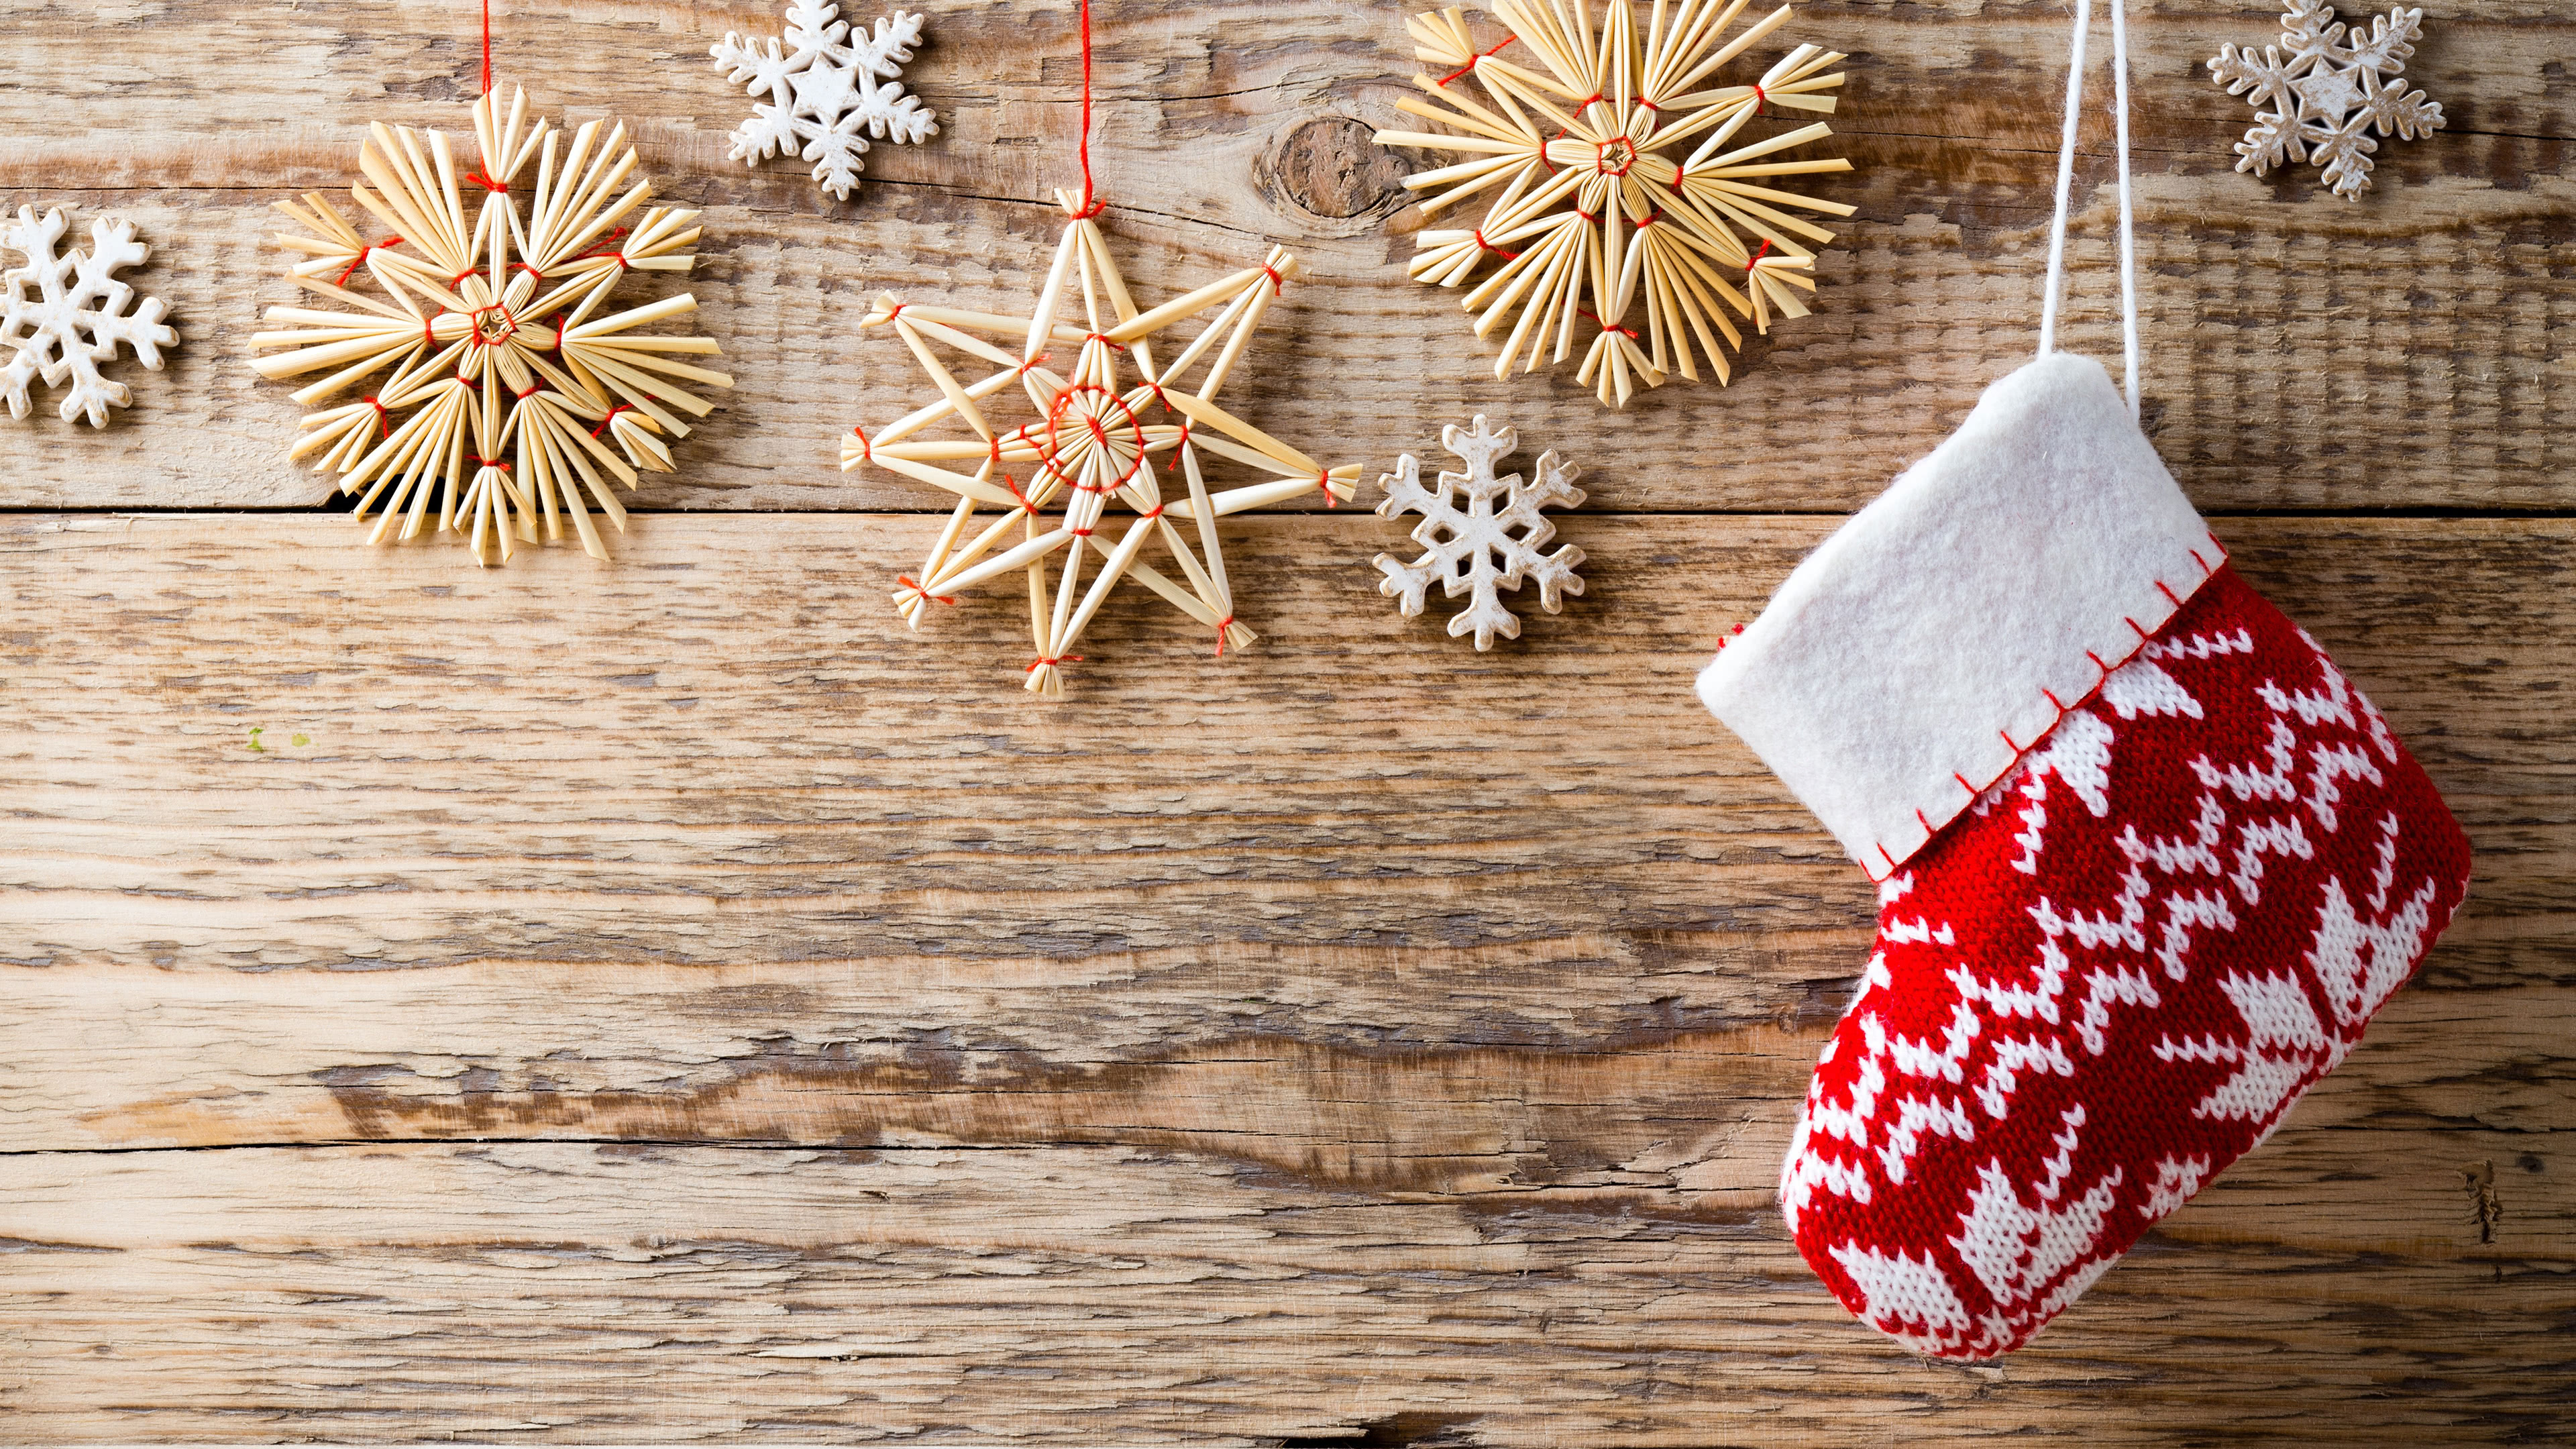 Christmas Decorations UHD 4K Wallpaper Pixelz 3840x2160